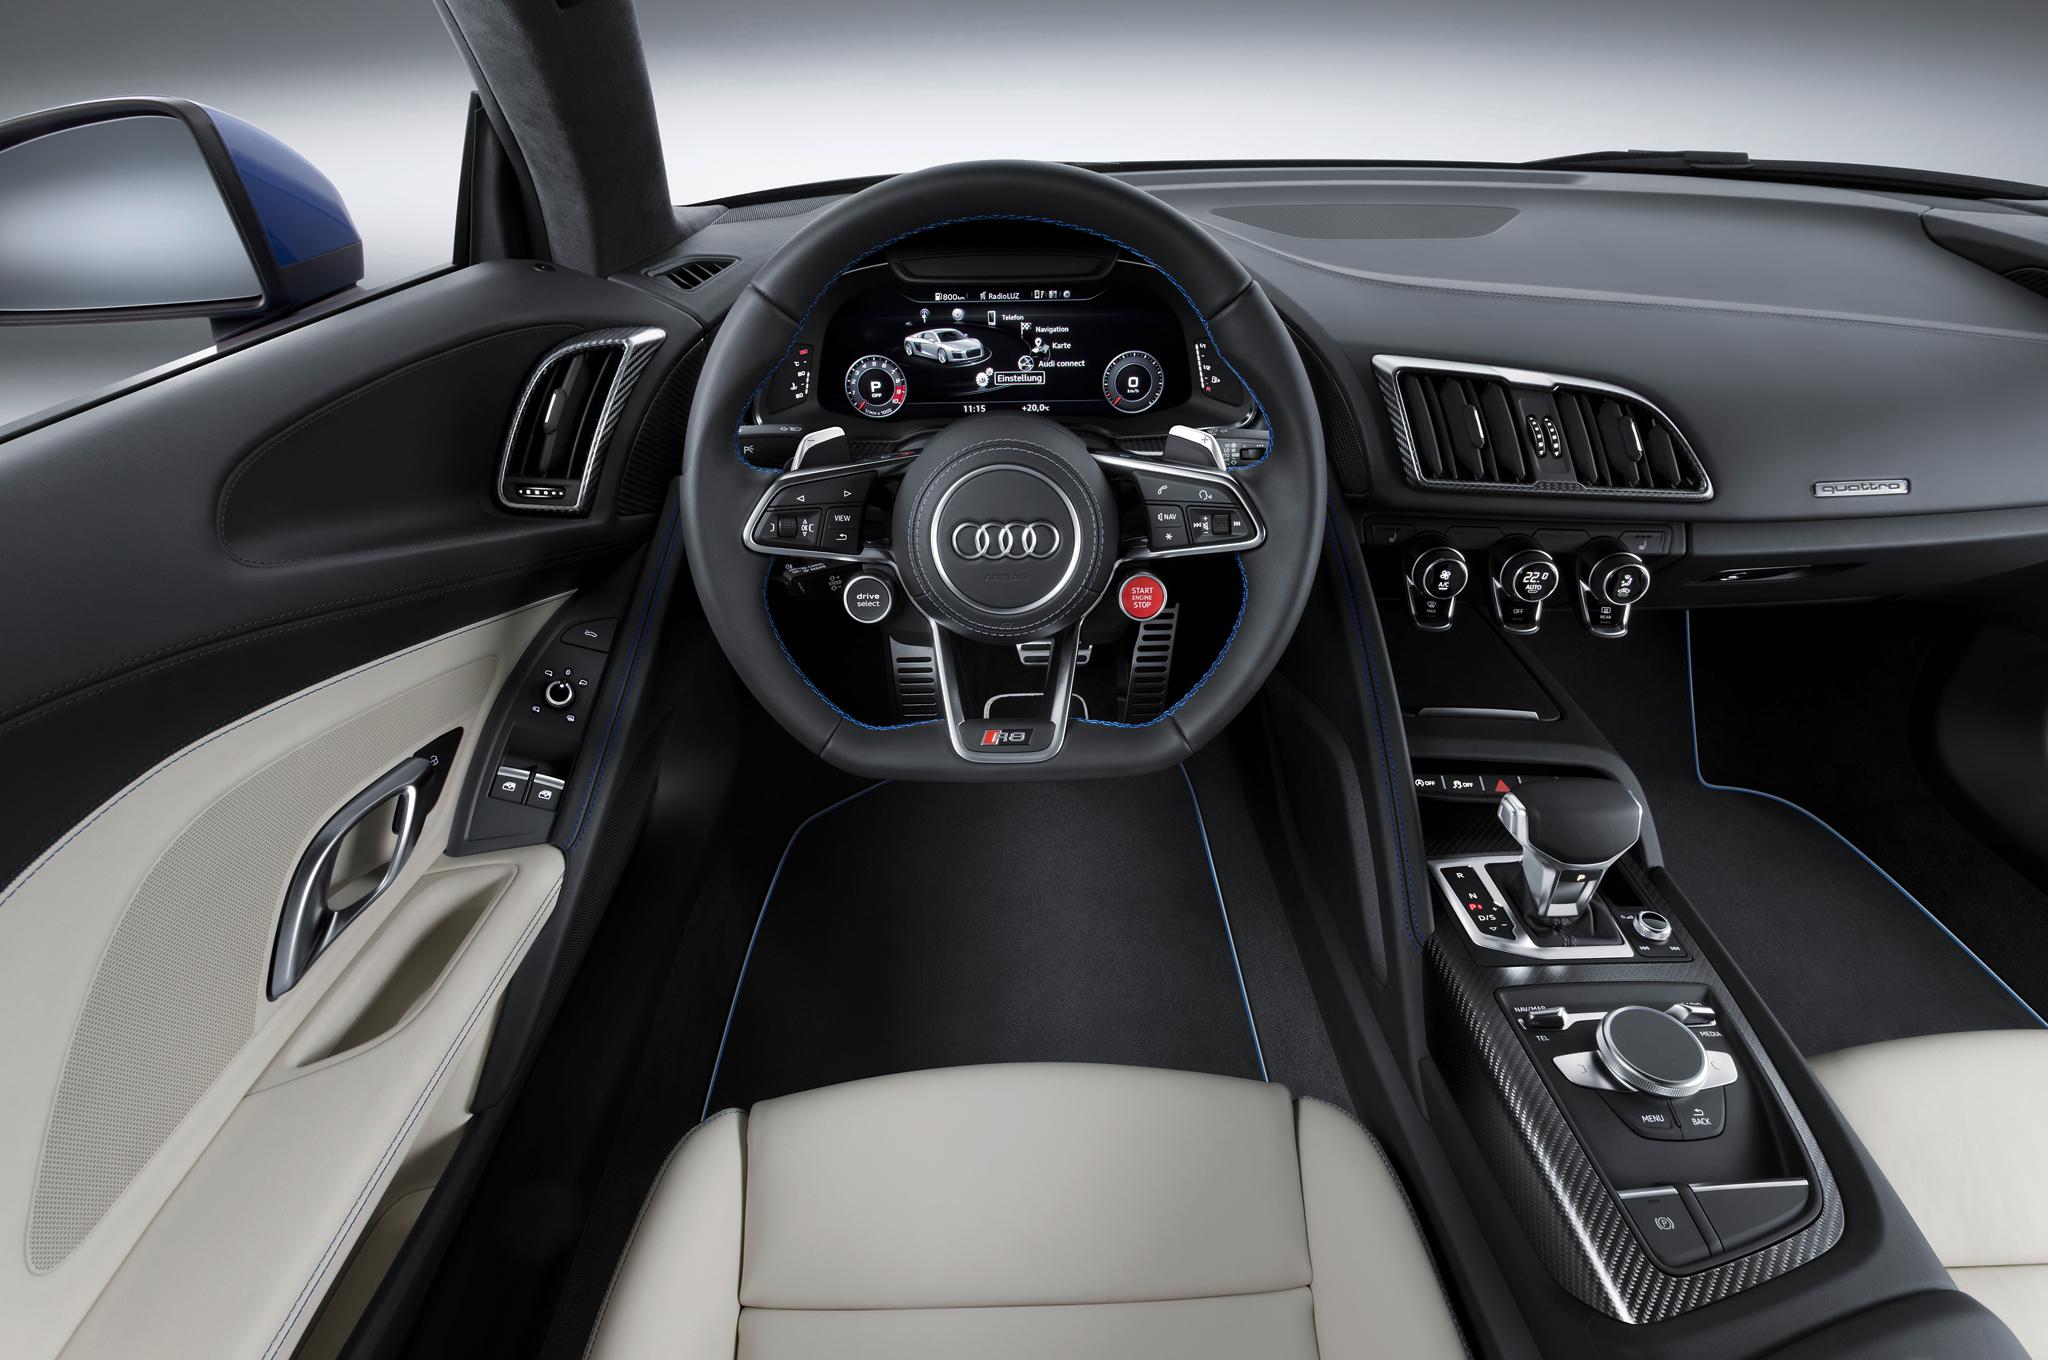 2017 Audi R8 V10 E Tron Is Fastest